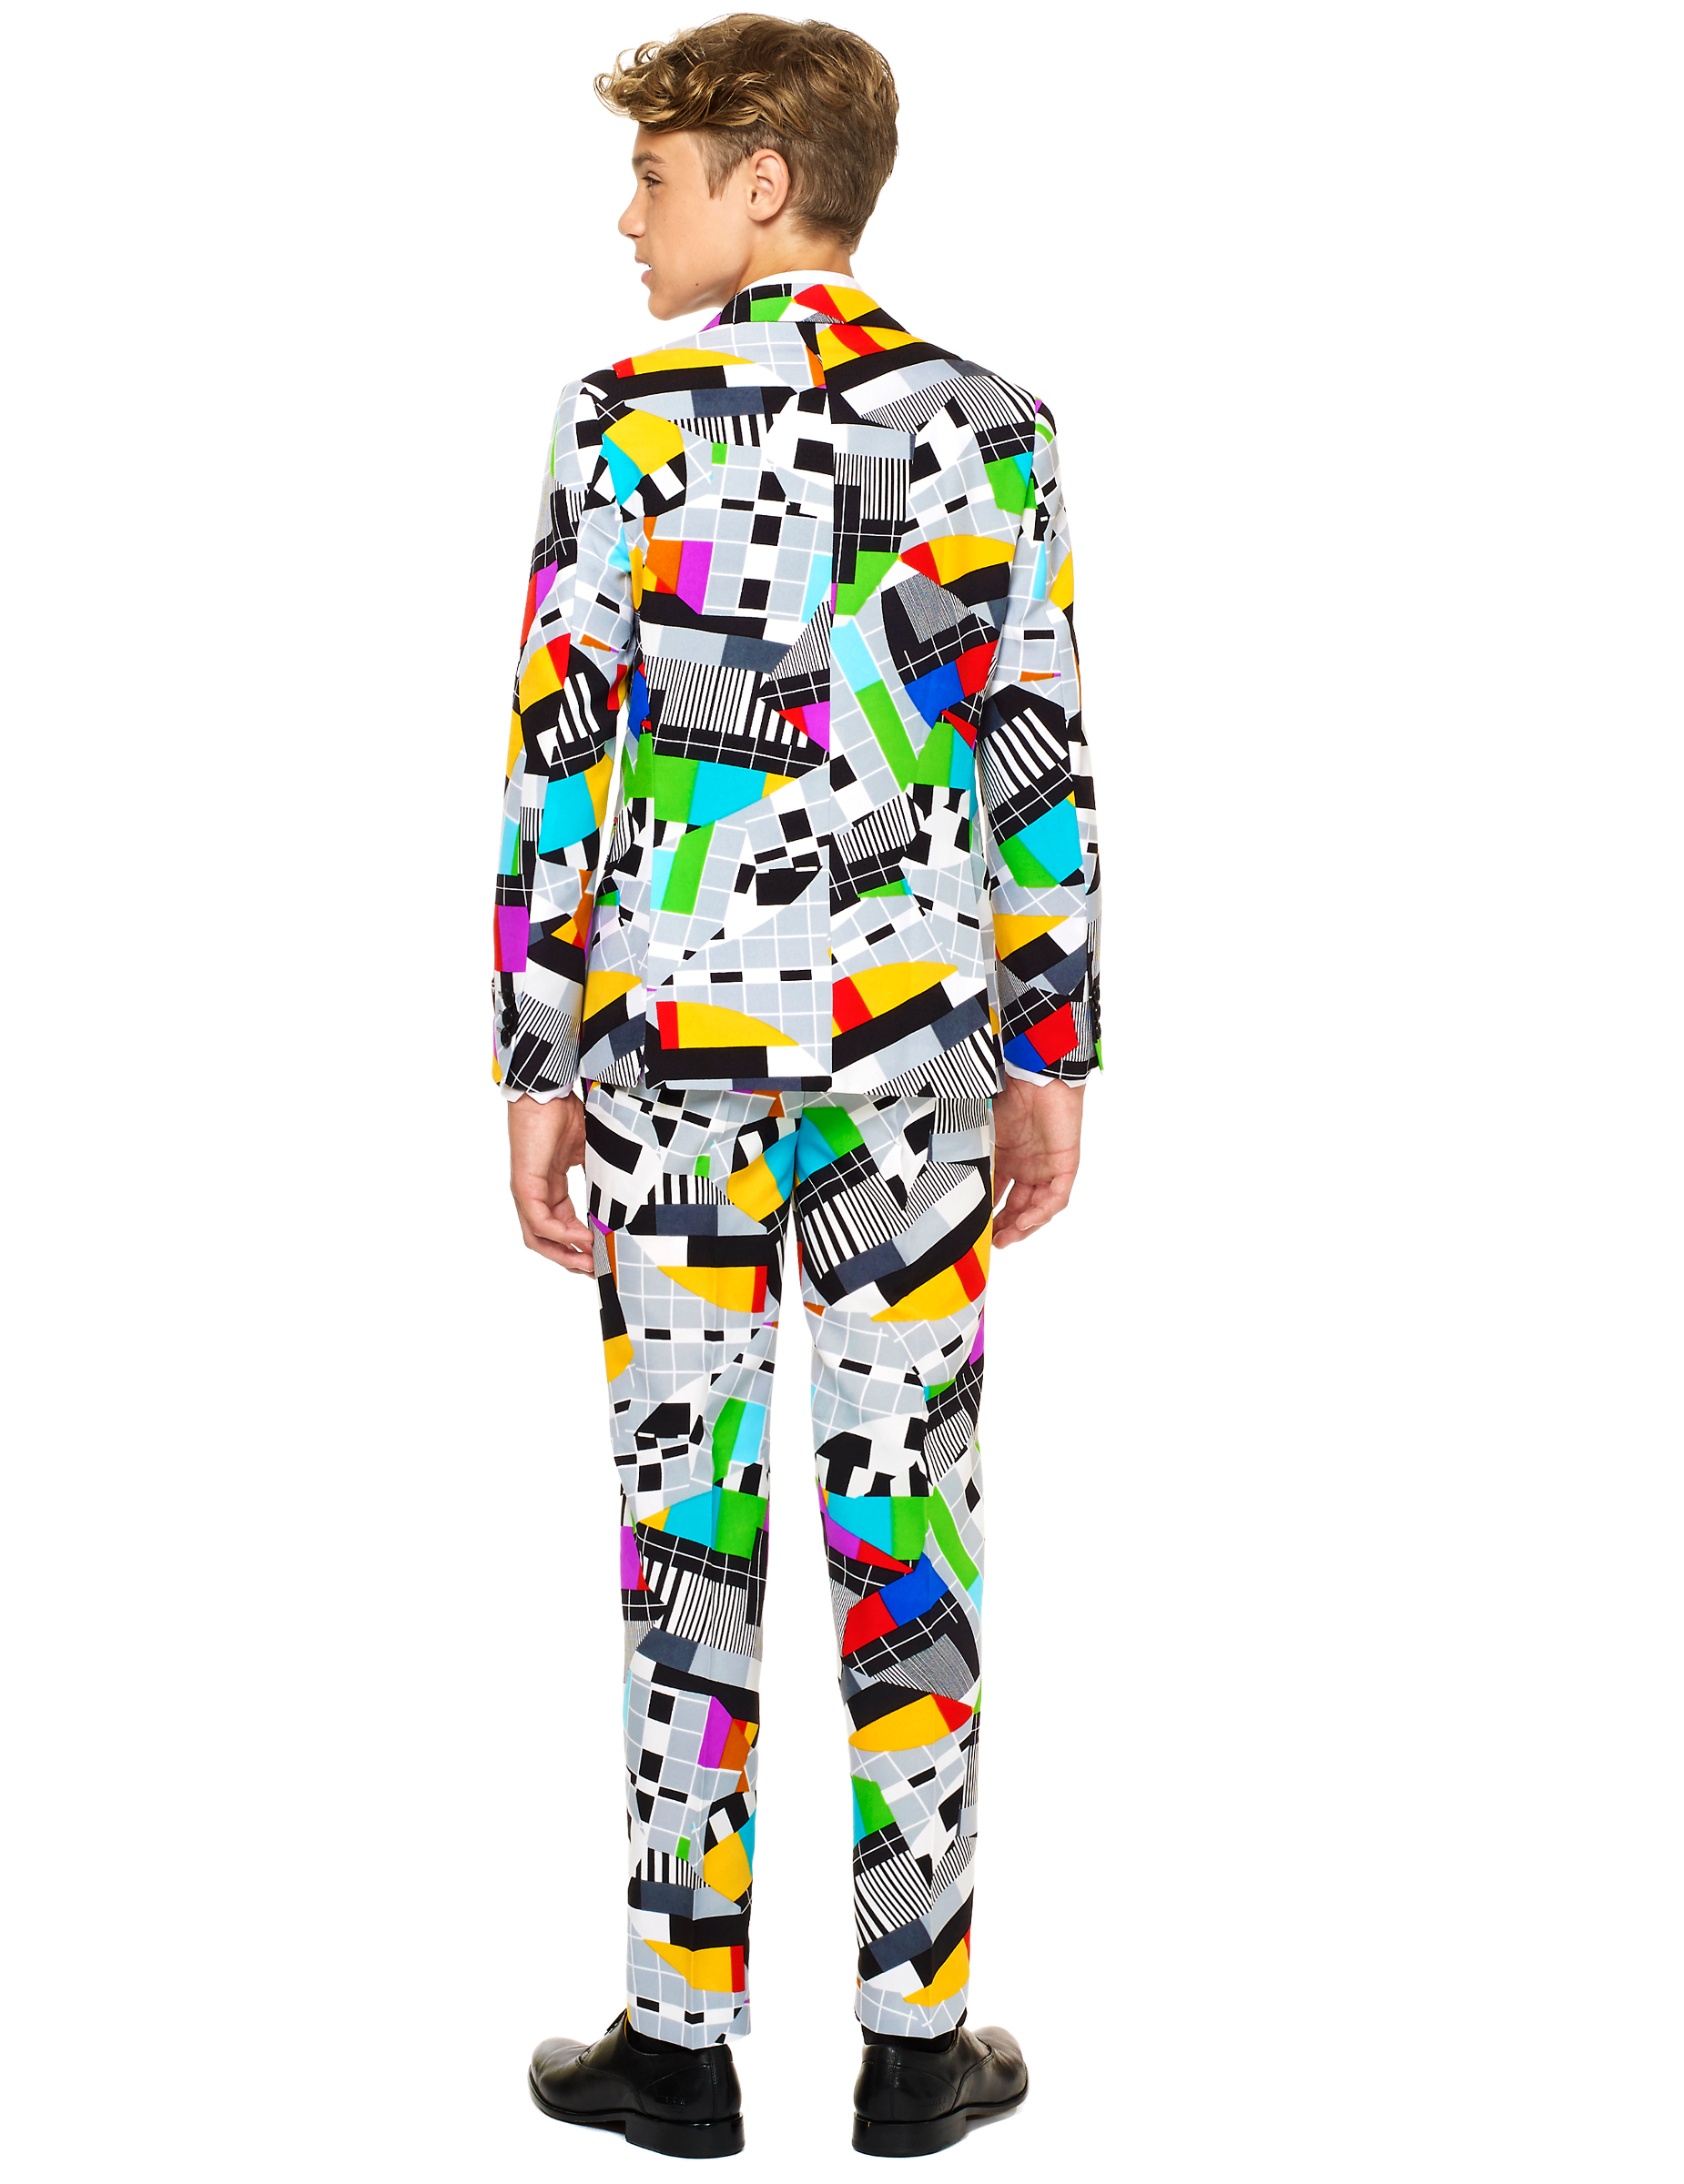 Noël coloré Costume Mr. Technicolor adolescent Opposuits Cod.308316 Cod.308316 Cod.308316 39ec7b